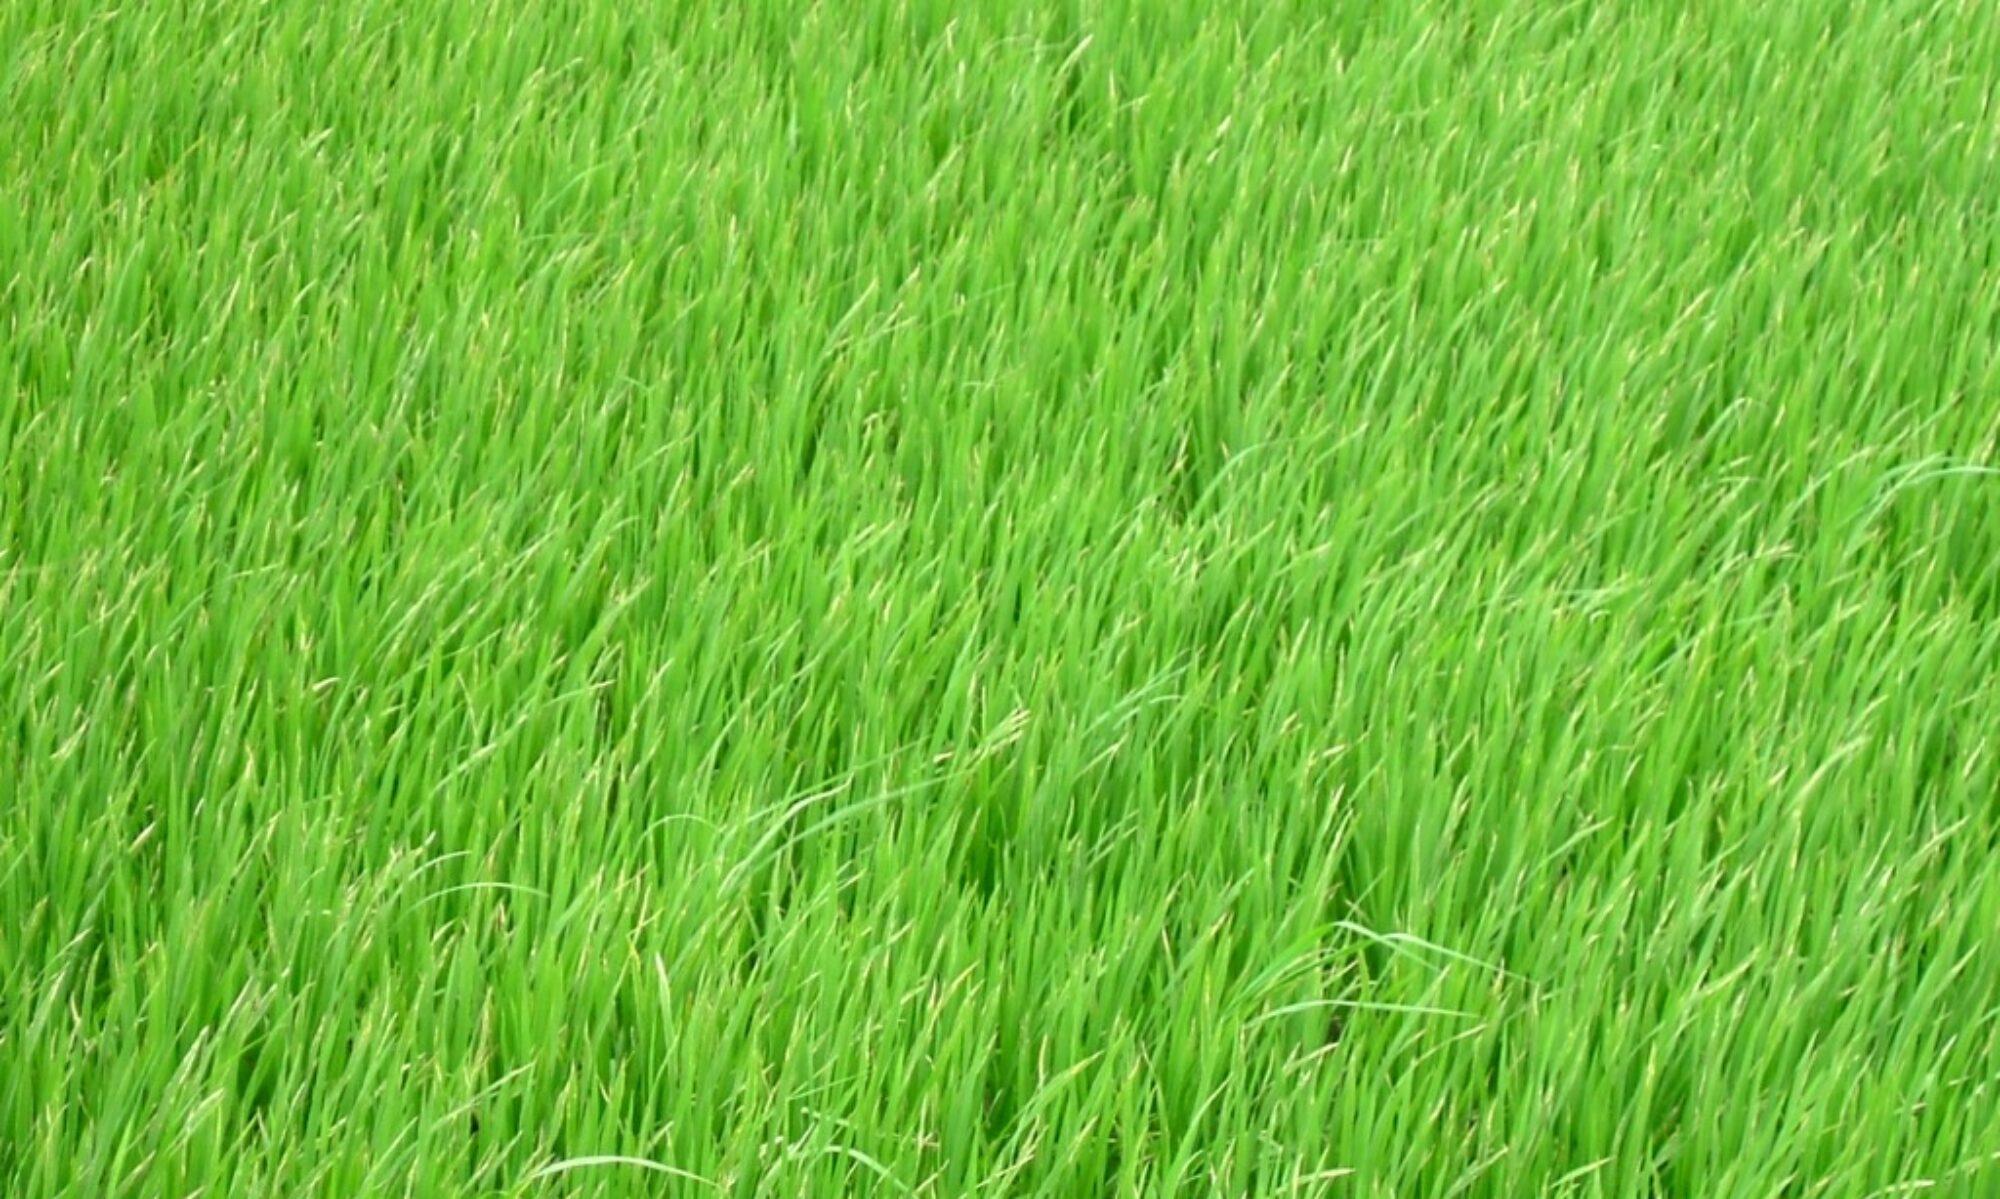 Rice Field, Viet Nam